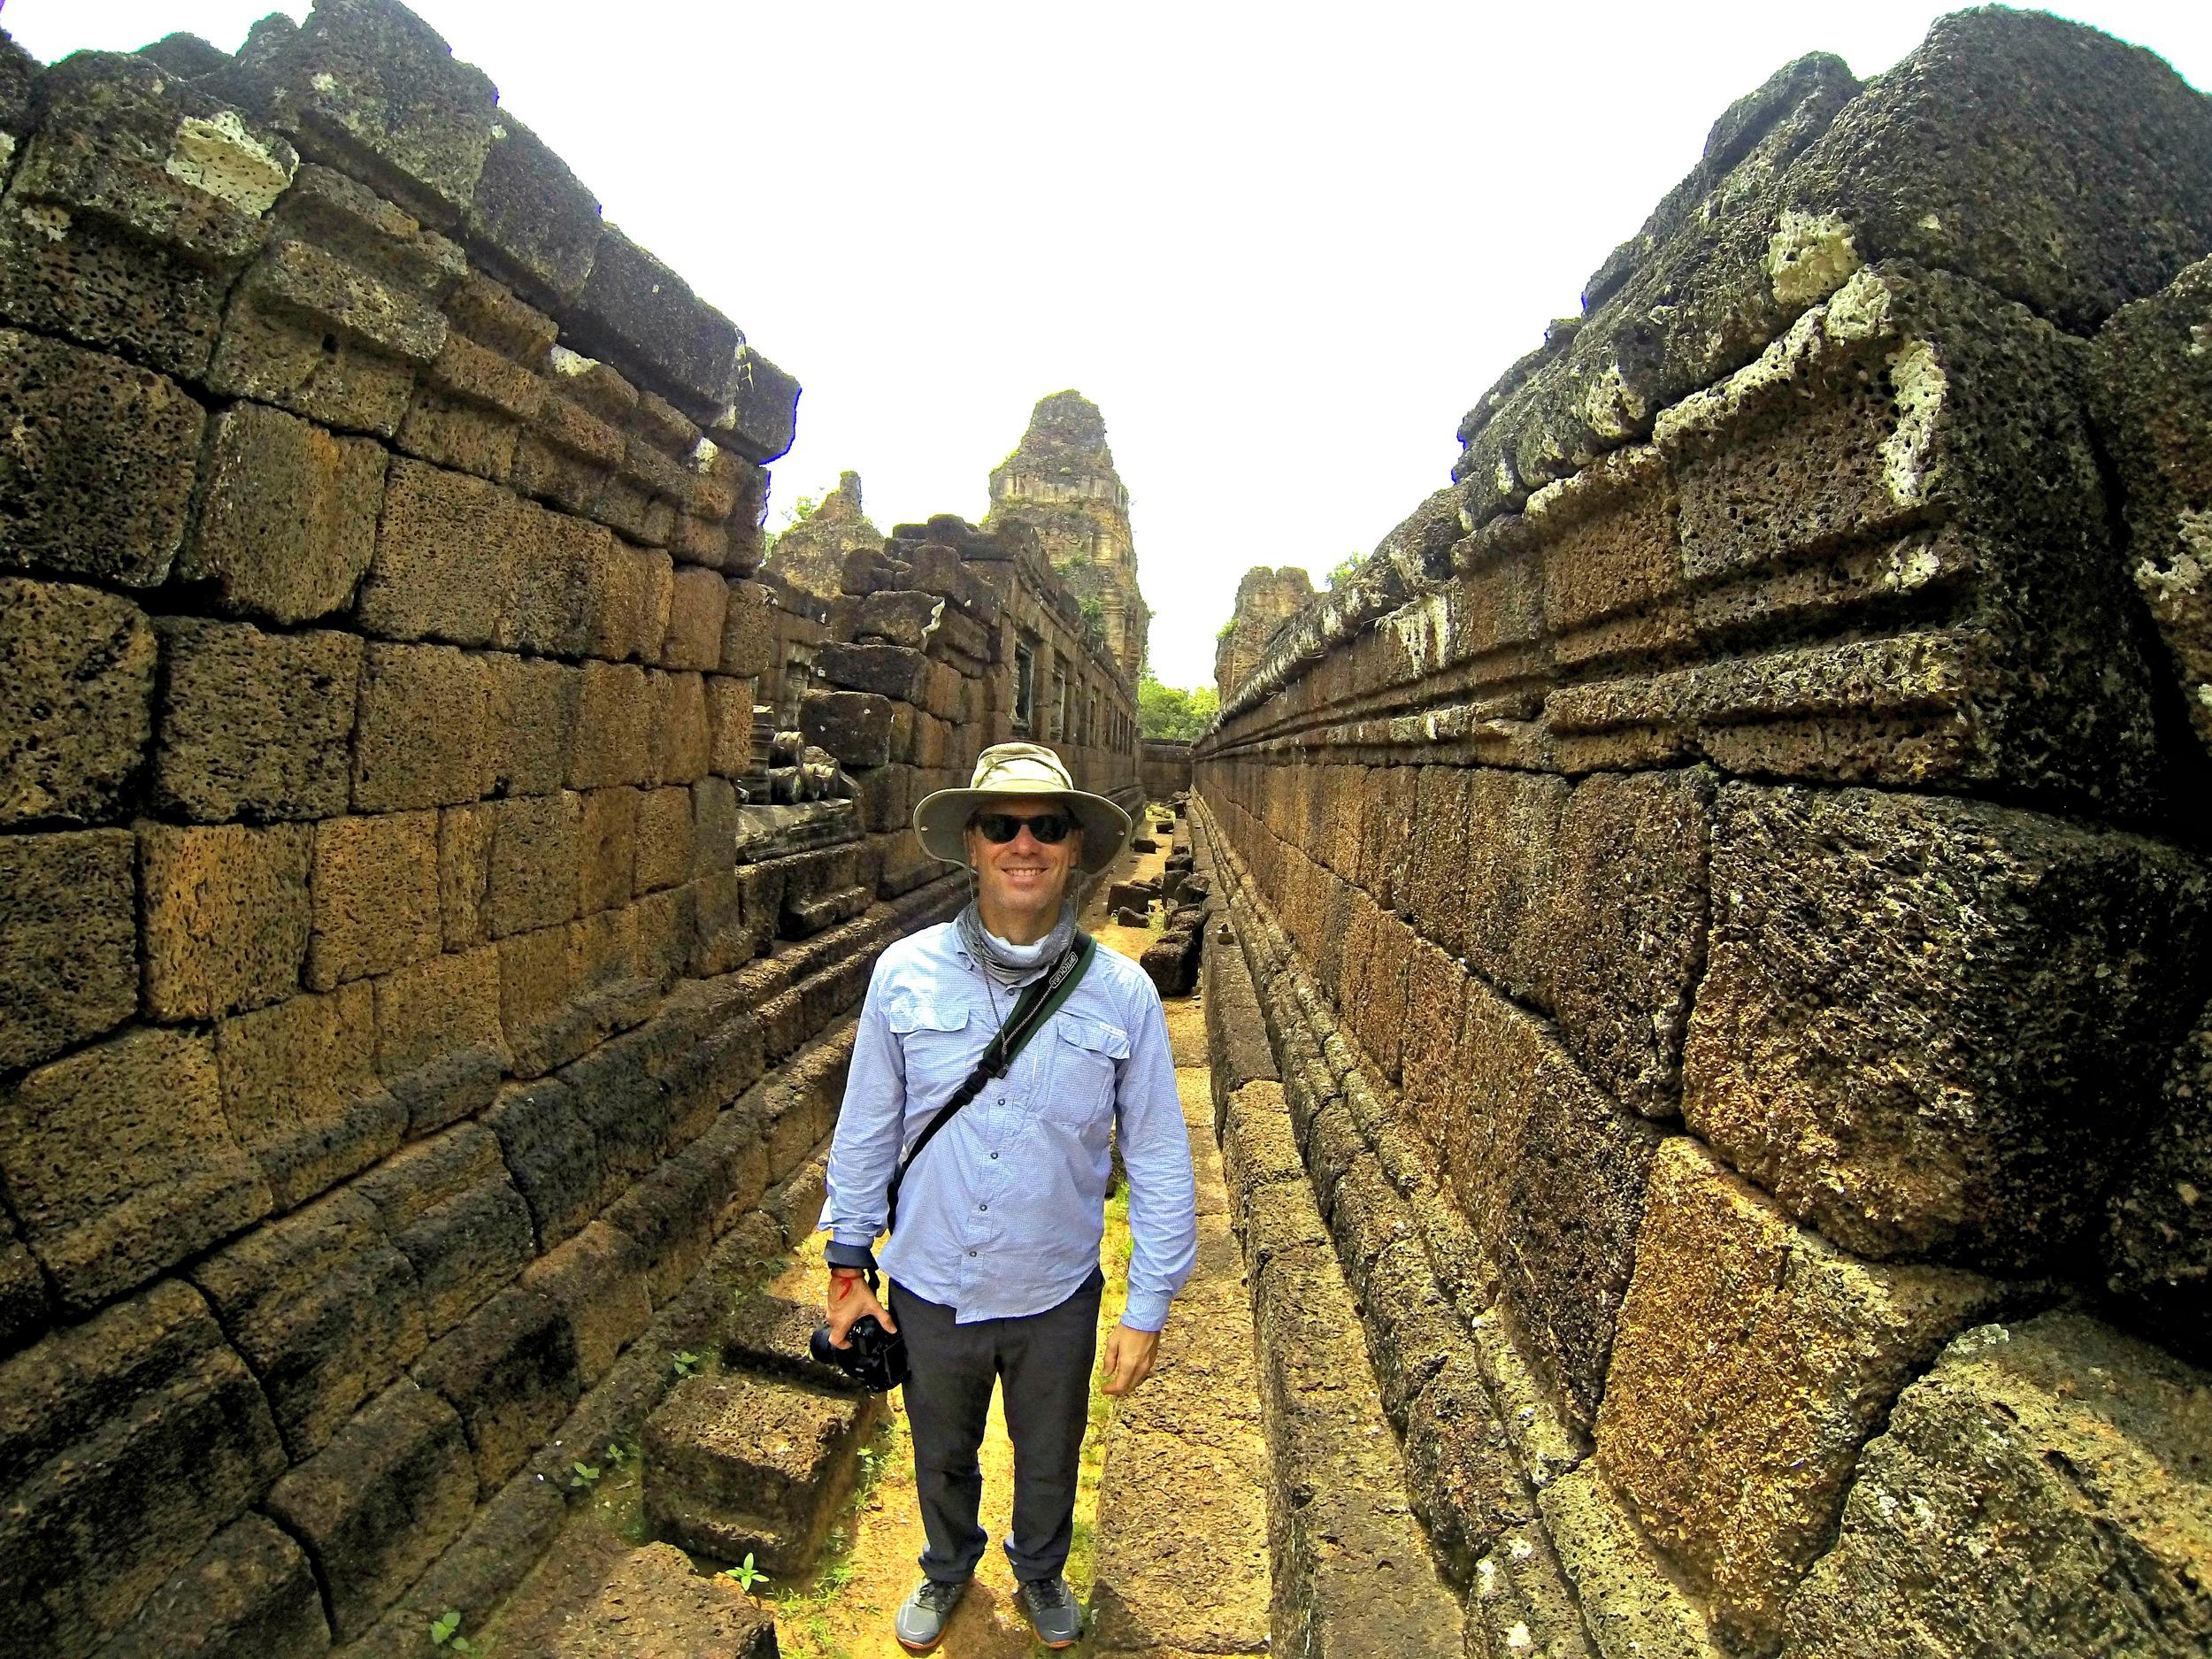 Pedestrian Photographer in Cambodia